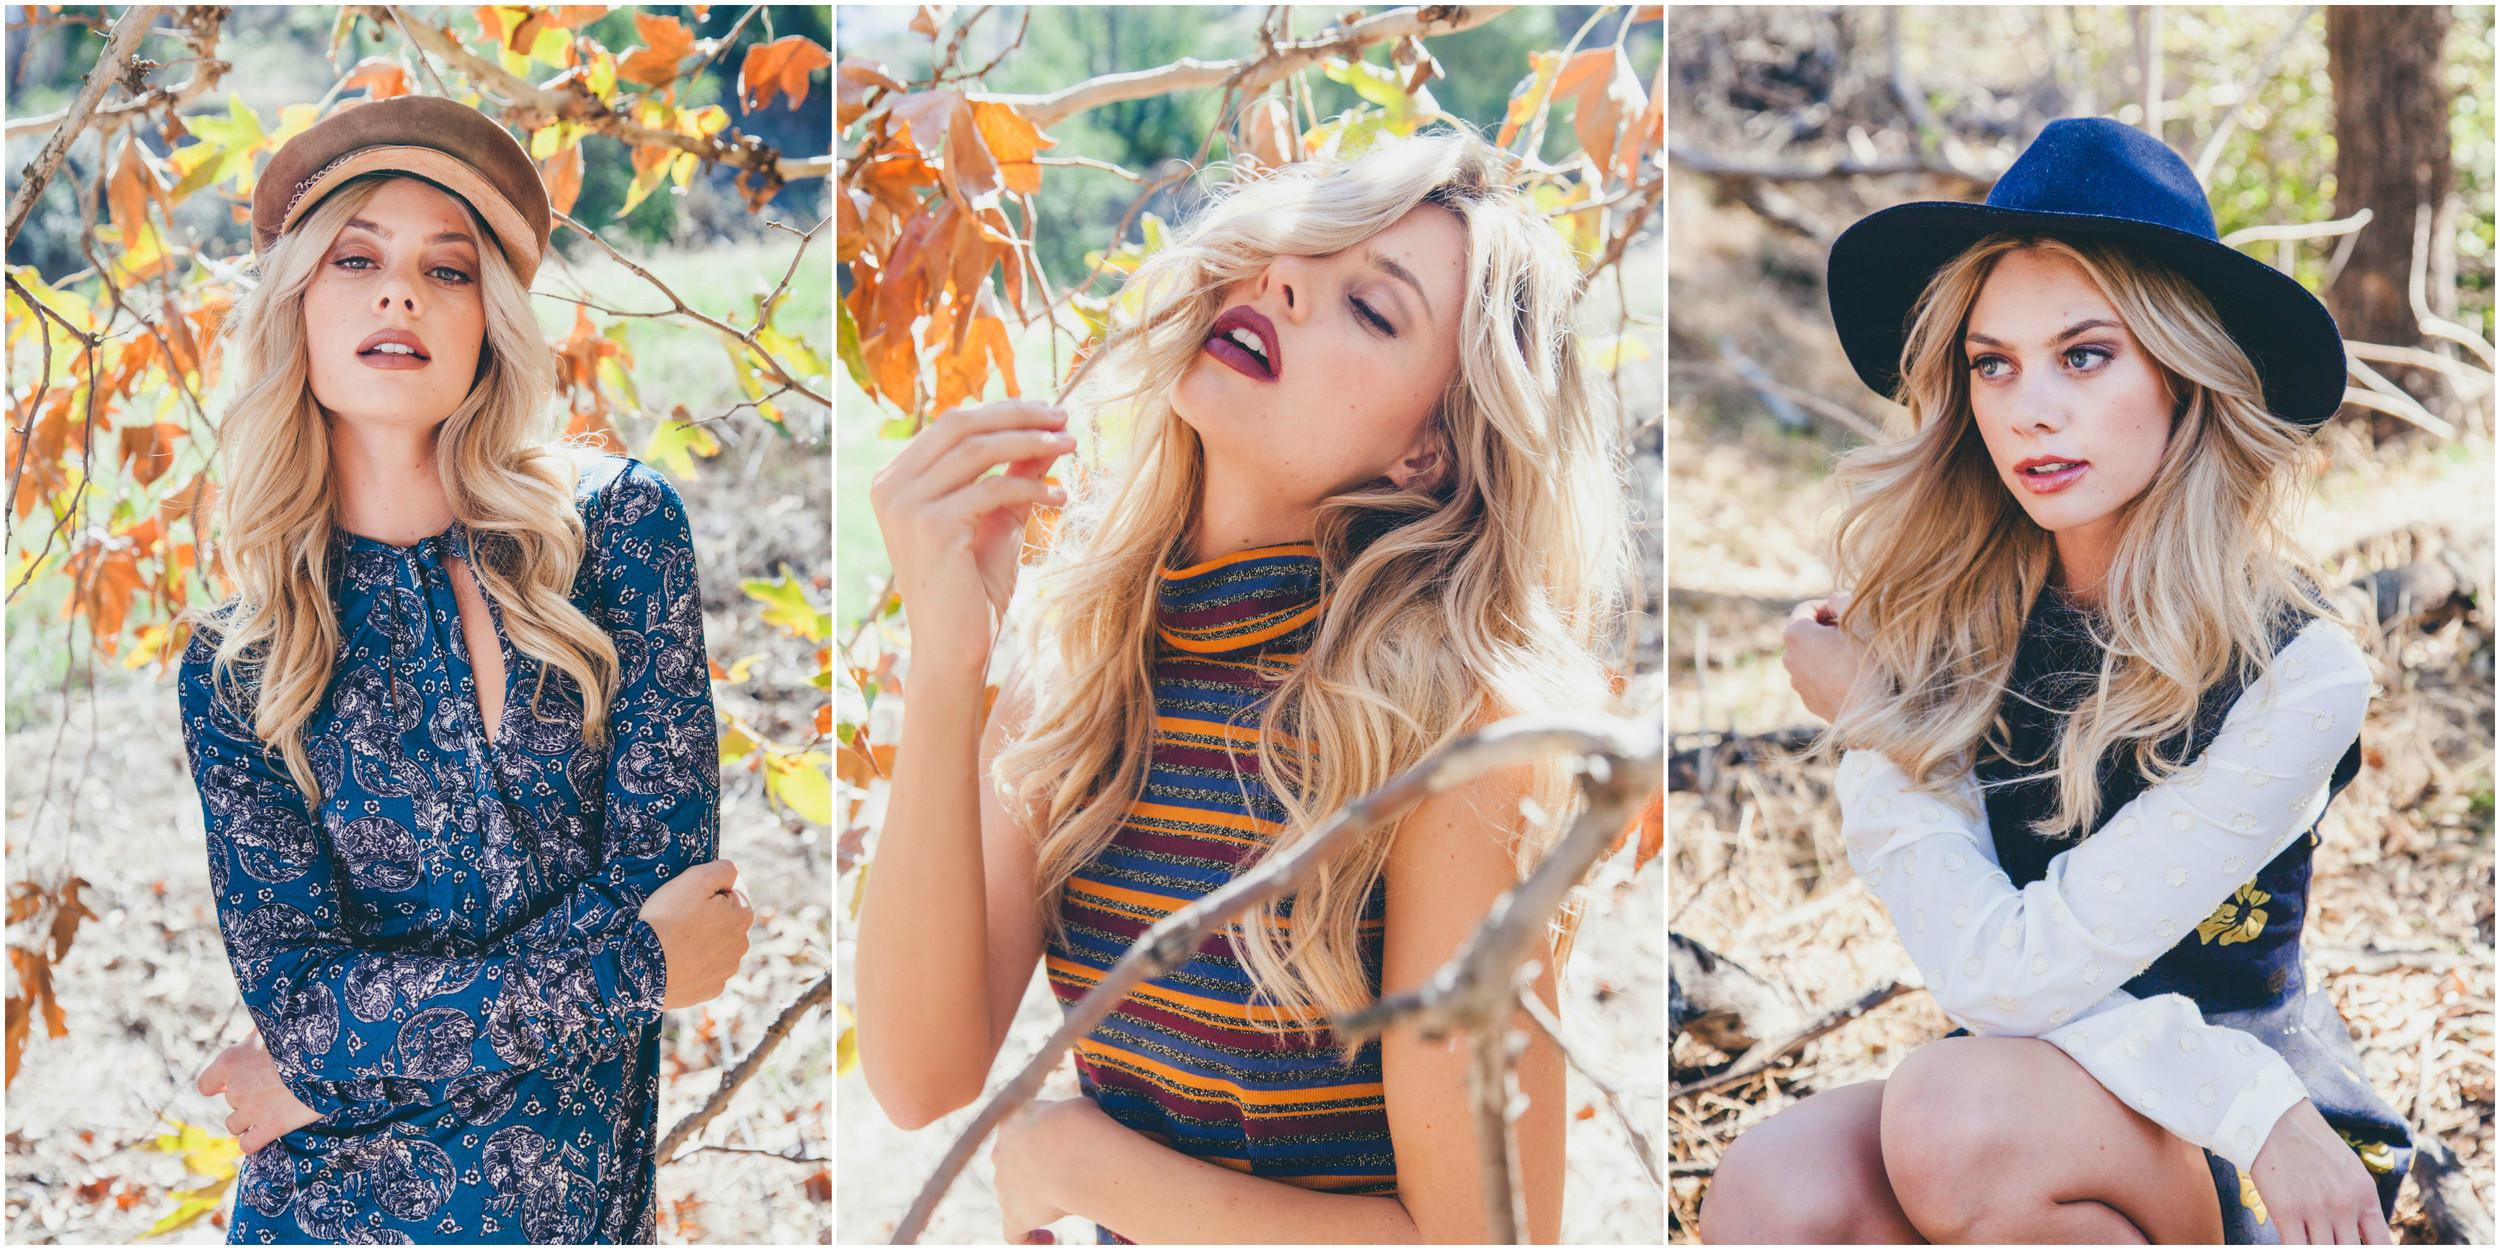 Hannah Collage 2.jpg